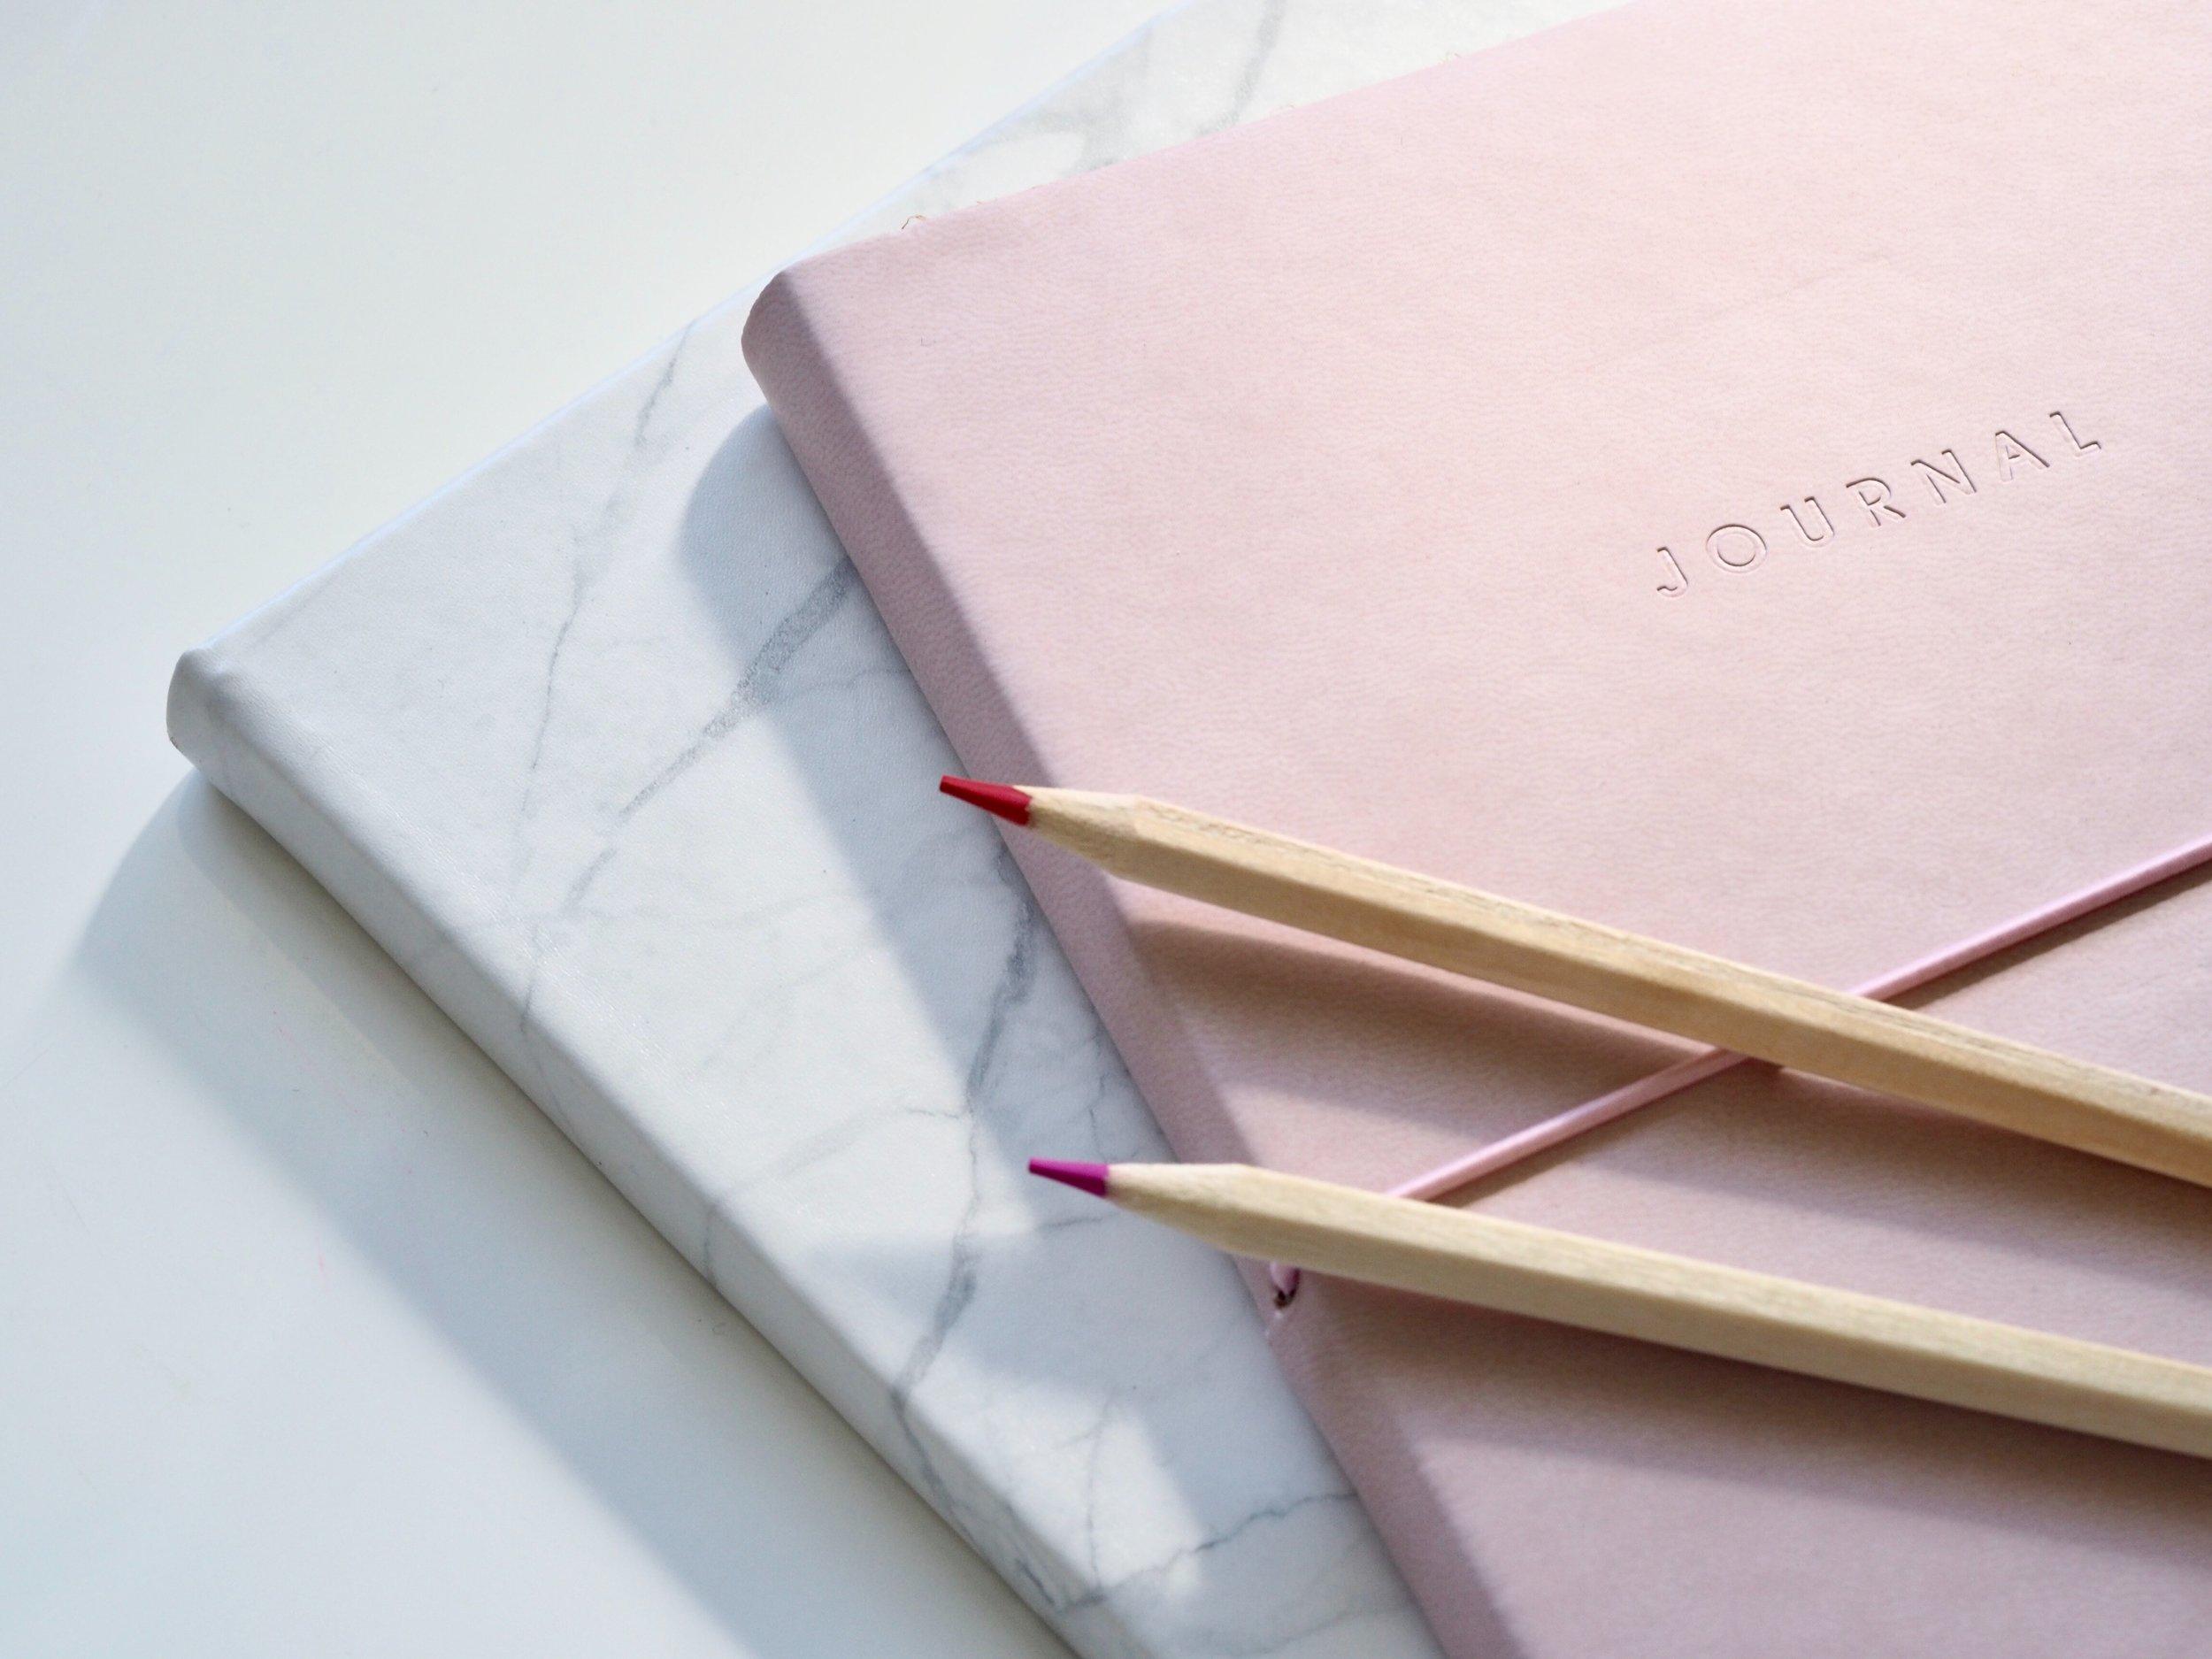 how-to-set-goals-pink-journal-by-jess-watters-unsplash.jpg